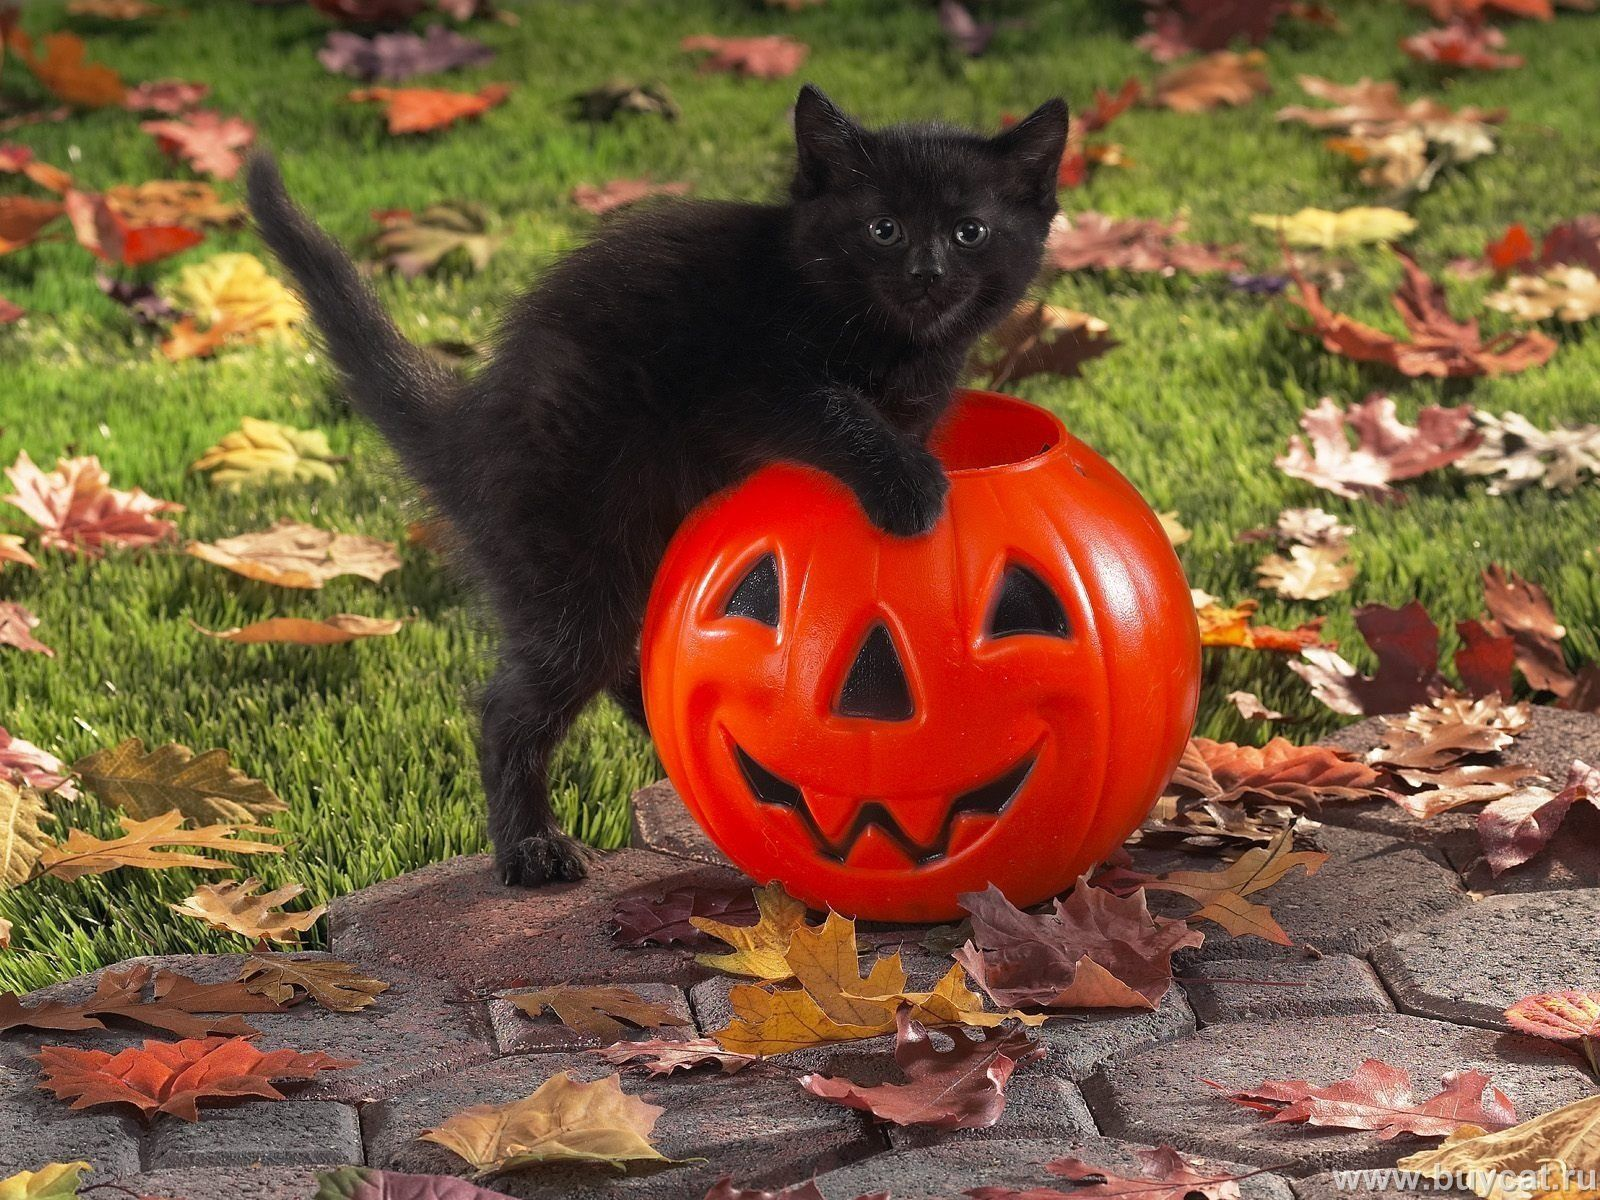 Black Cat Celebrates Halloween Cat Celebrating Cute Black Cats Cute Cats And Kittens